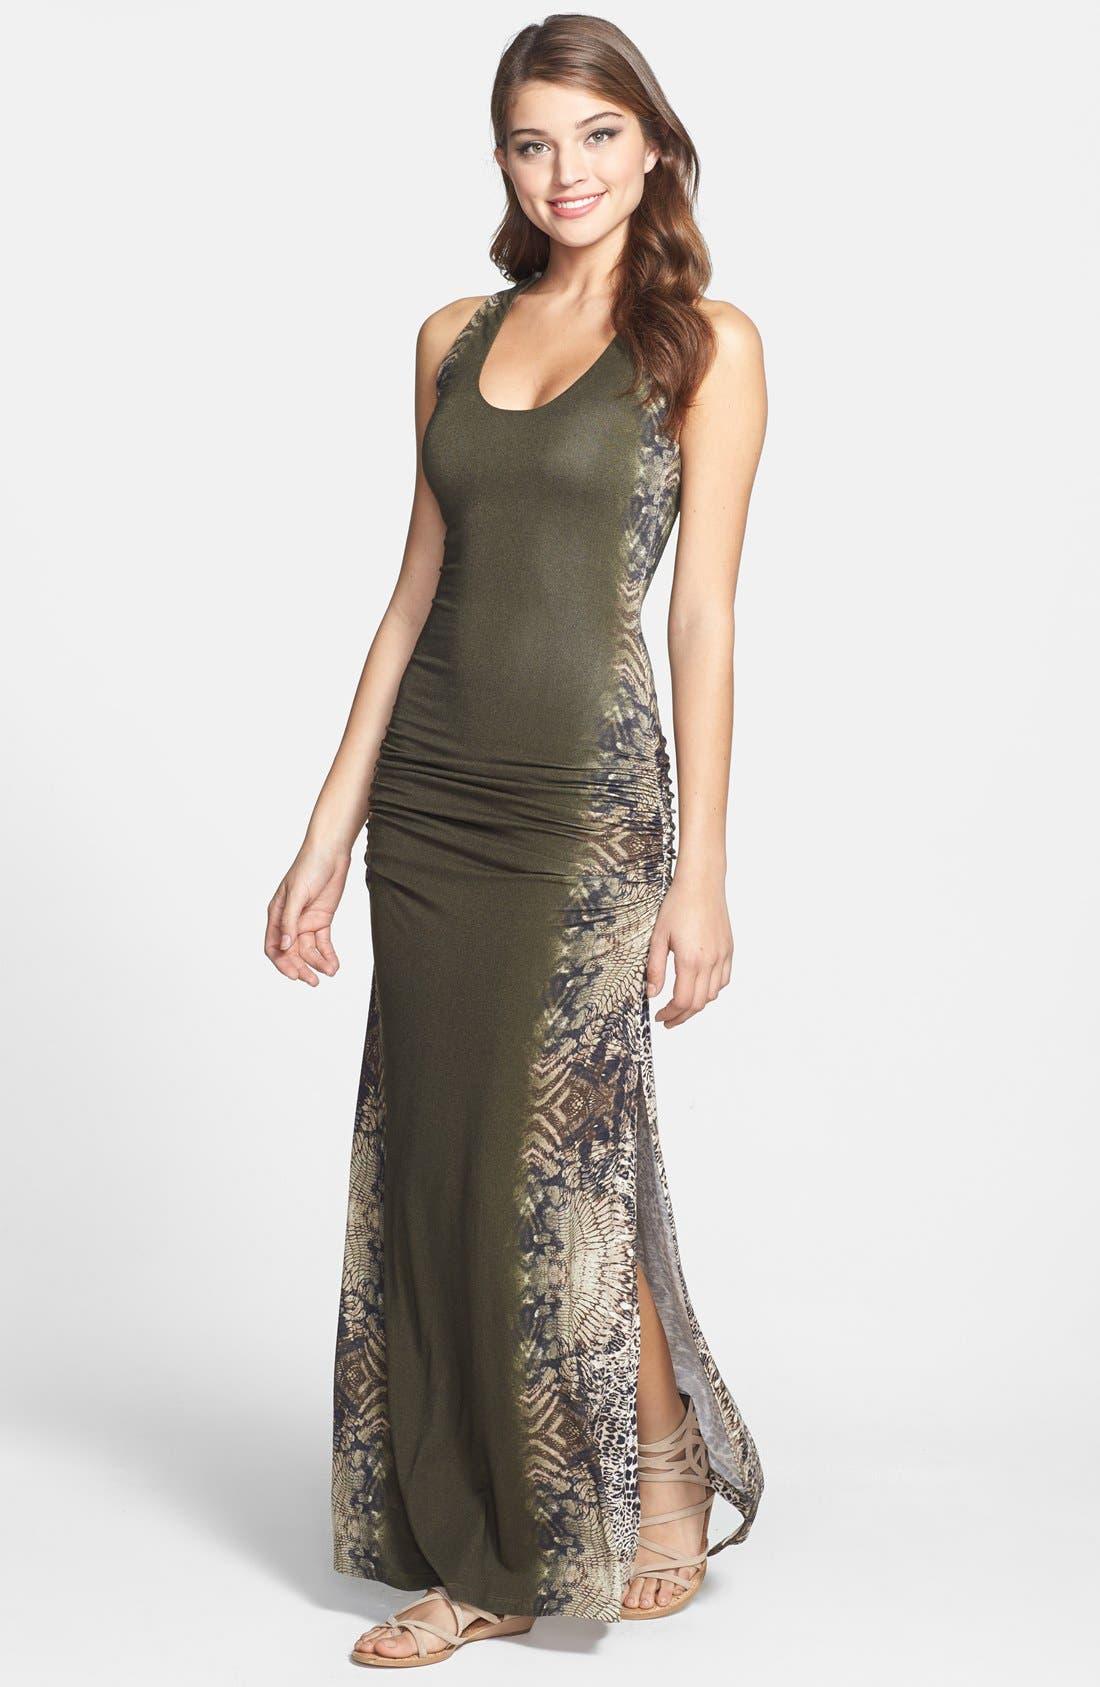 Alternate Image 1 Selected - Sky 'Iakova' Print Ruched Jersey Maxi Dress